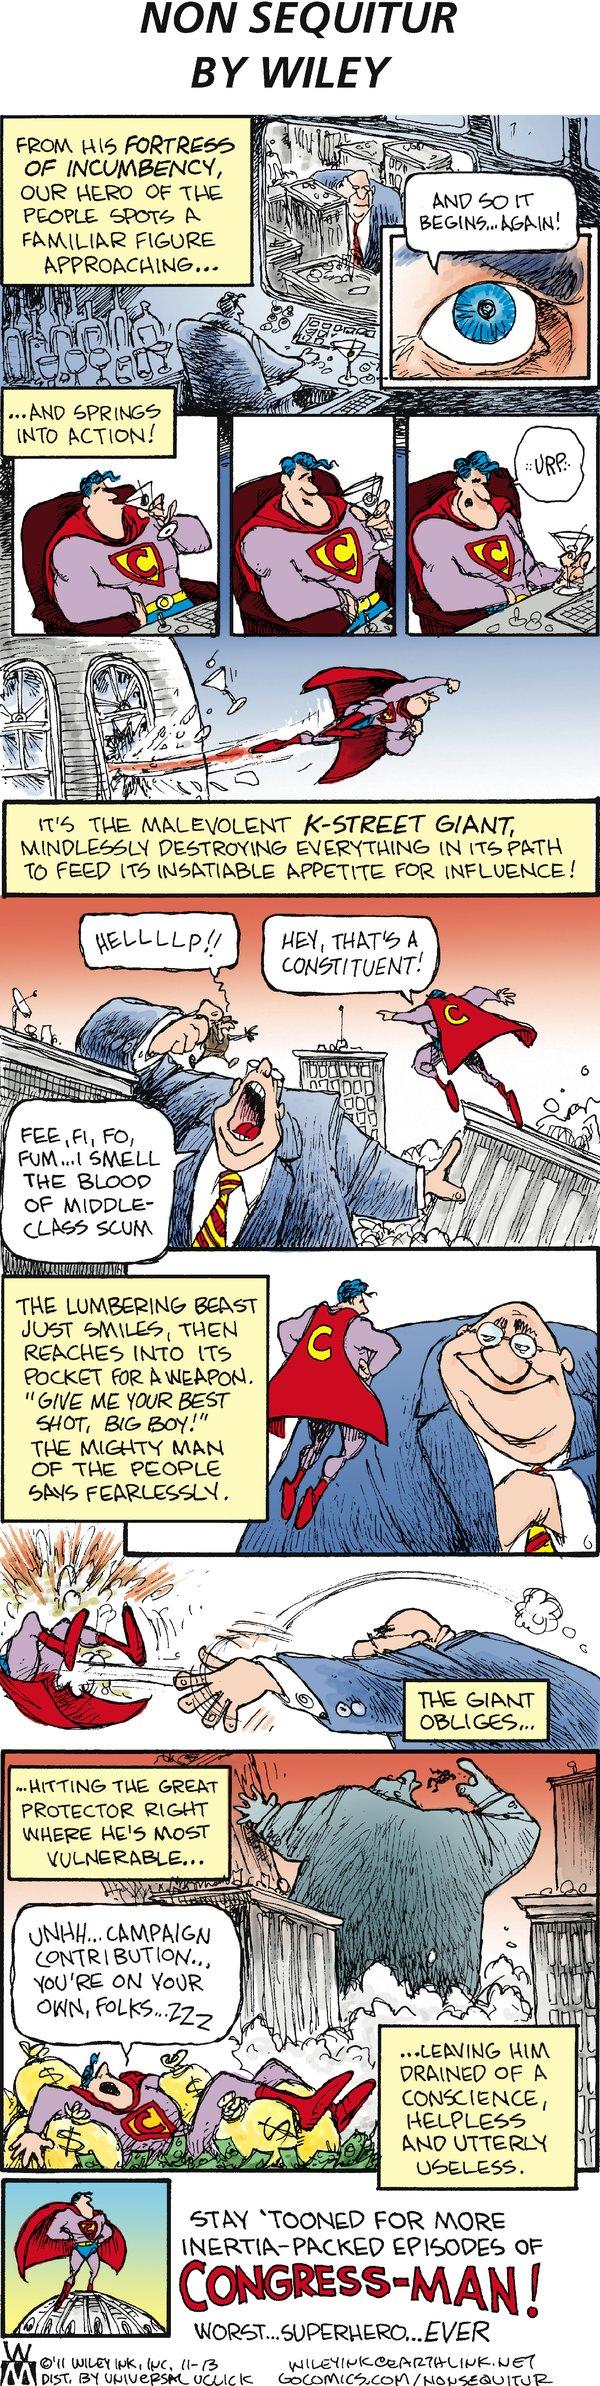 Non Sequitur for Nov 13, 2011 Comic Strip